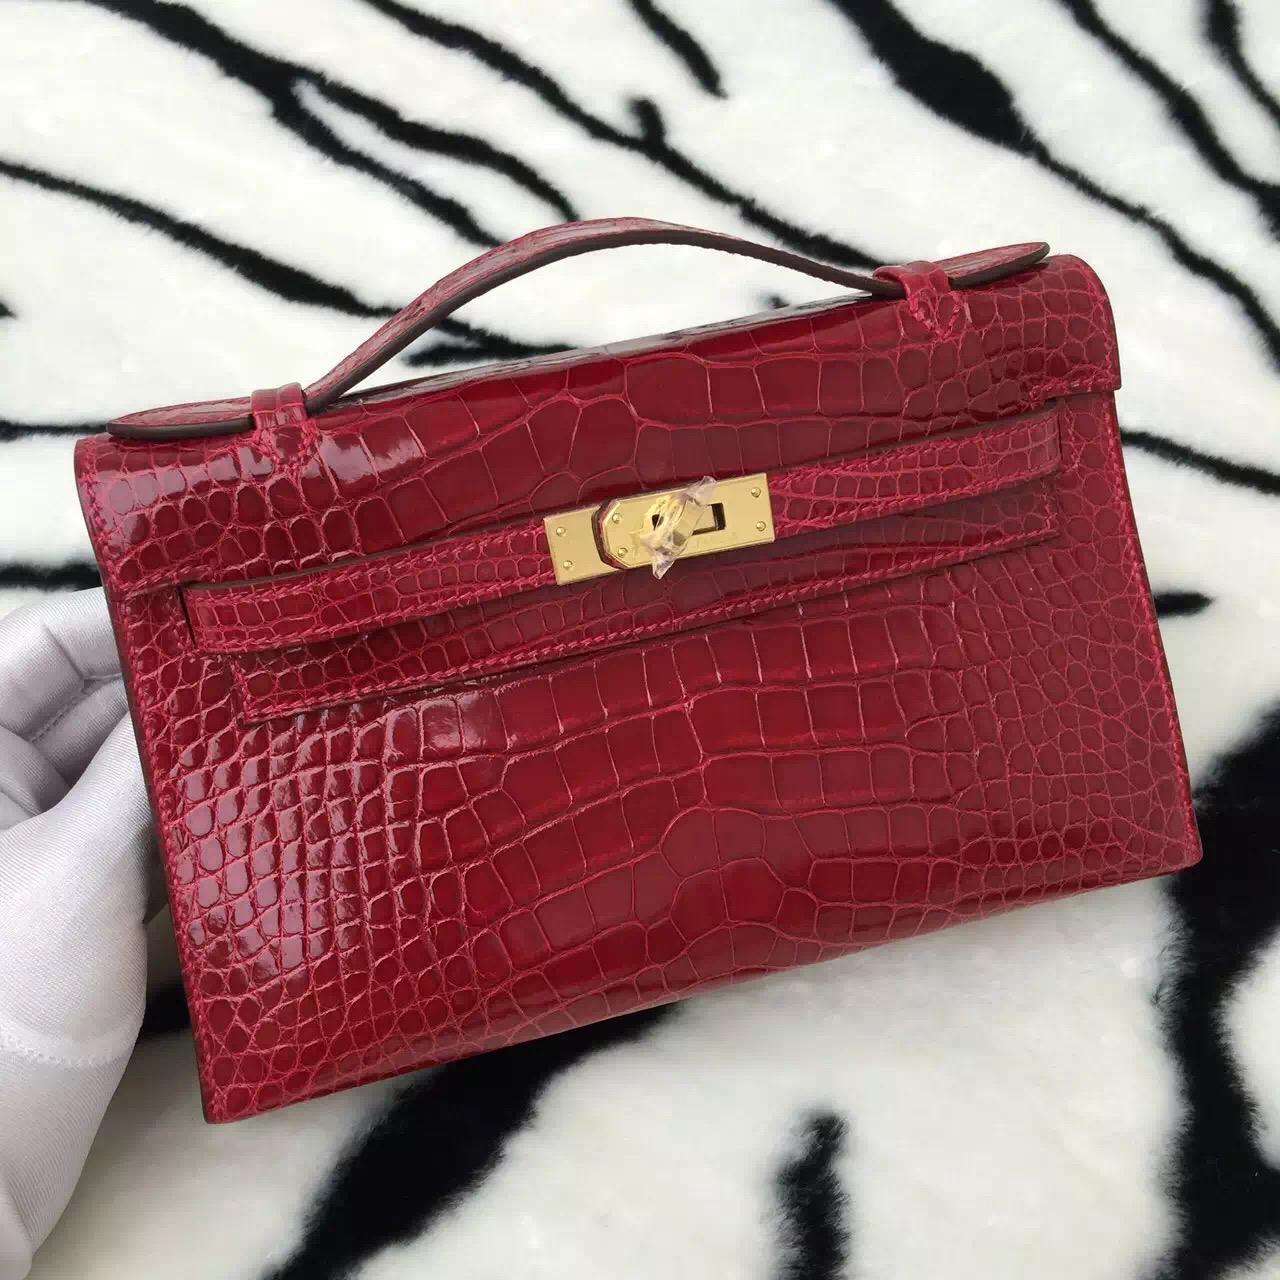 New Fashion Hermes Crocodile Skin Mini Kelly Bag Women's Handbag CK95 Ferrari Red